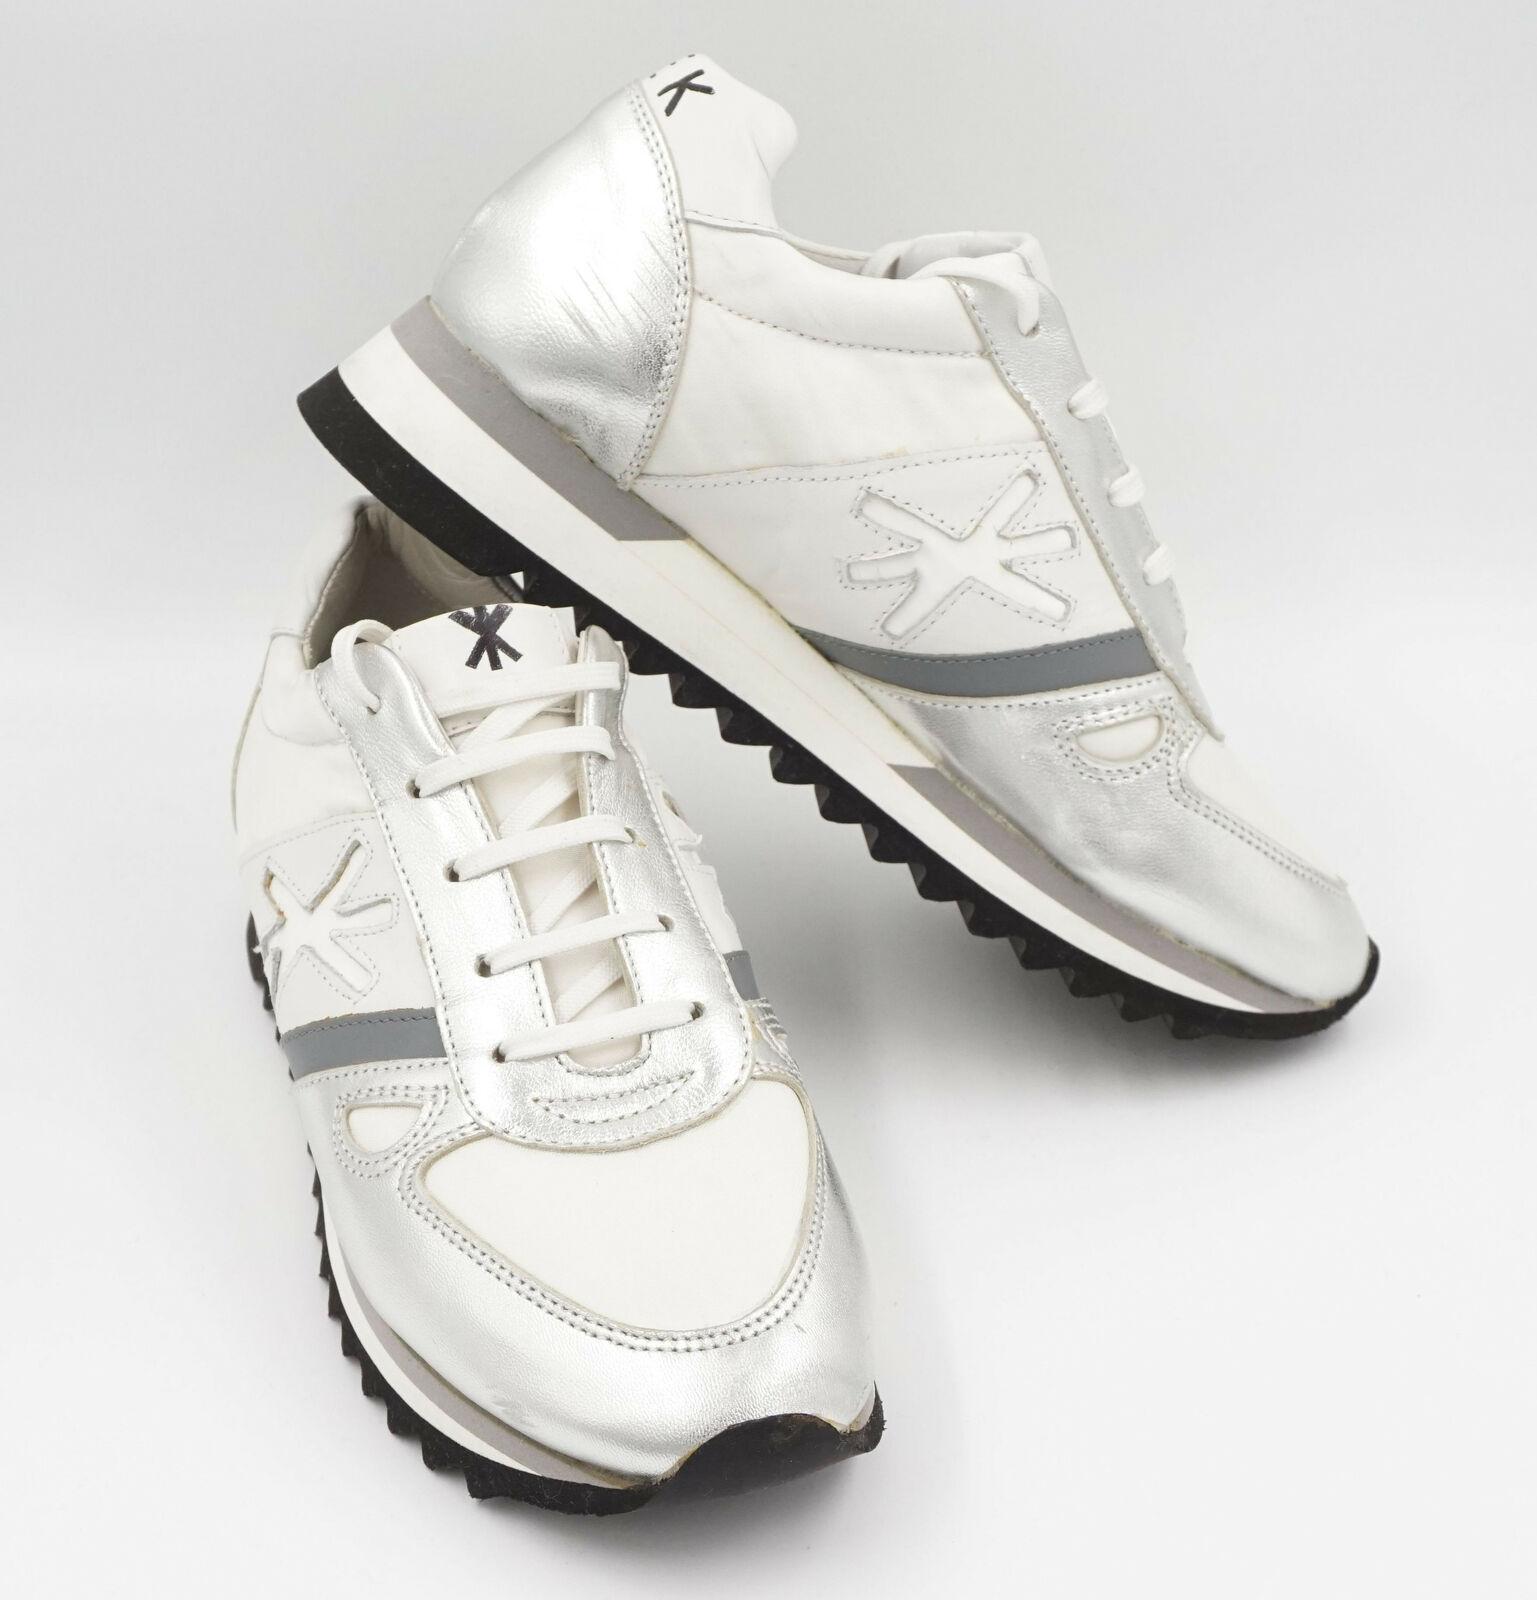 Kroll sneaker femmes taille 37 blanc argent cuir